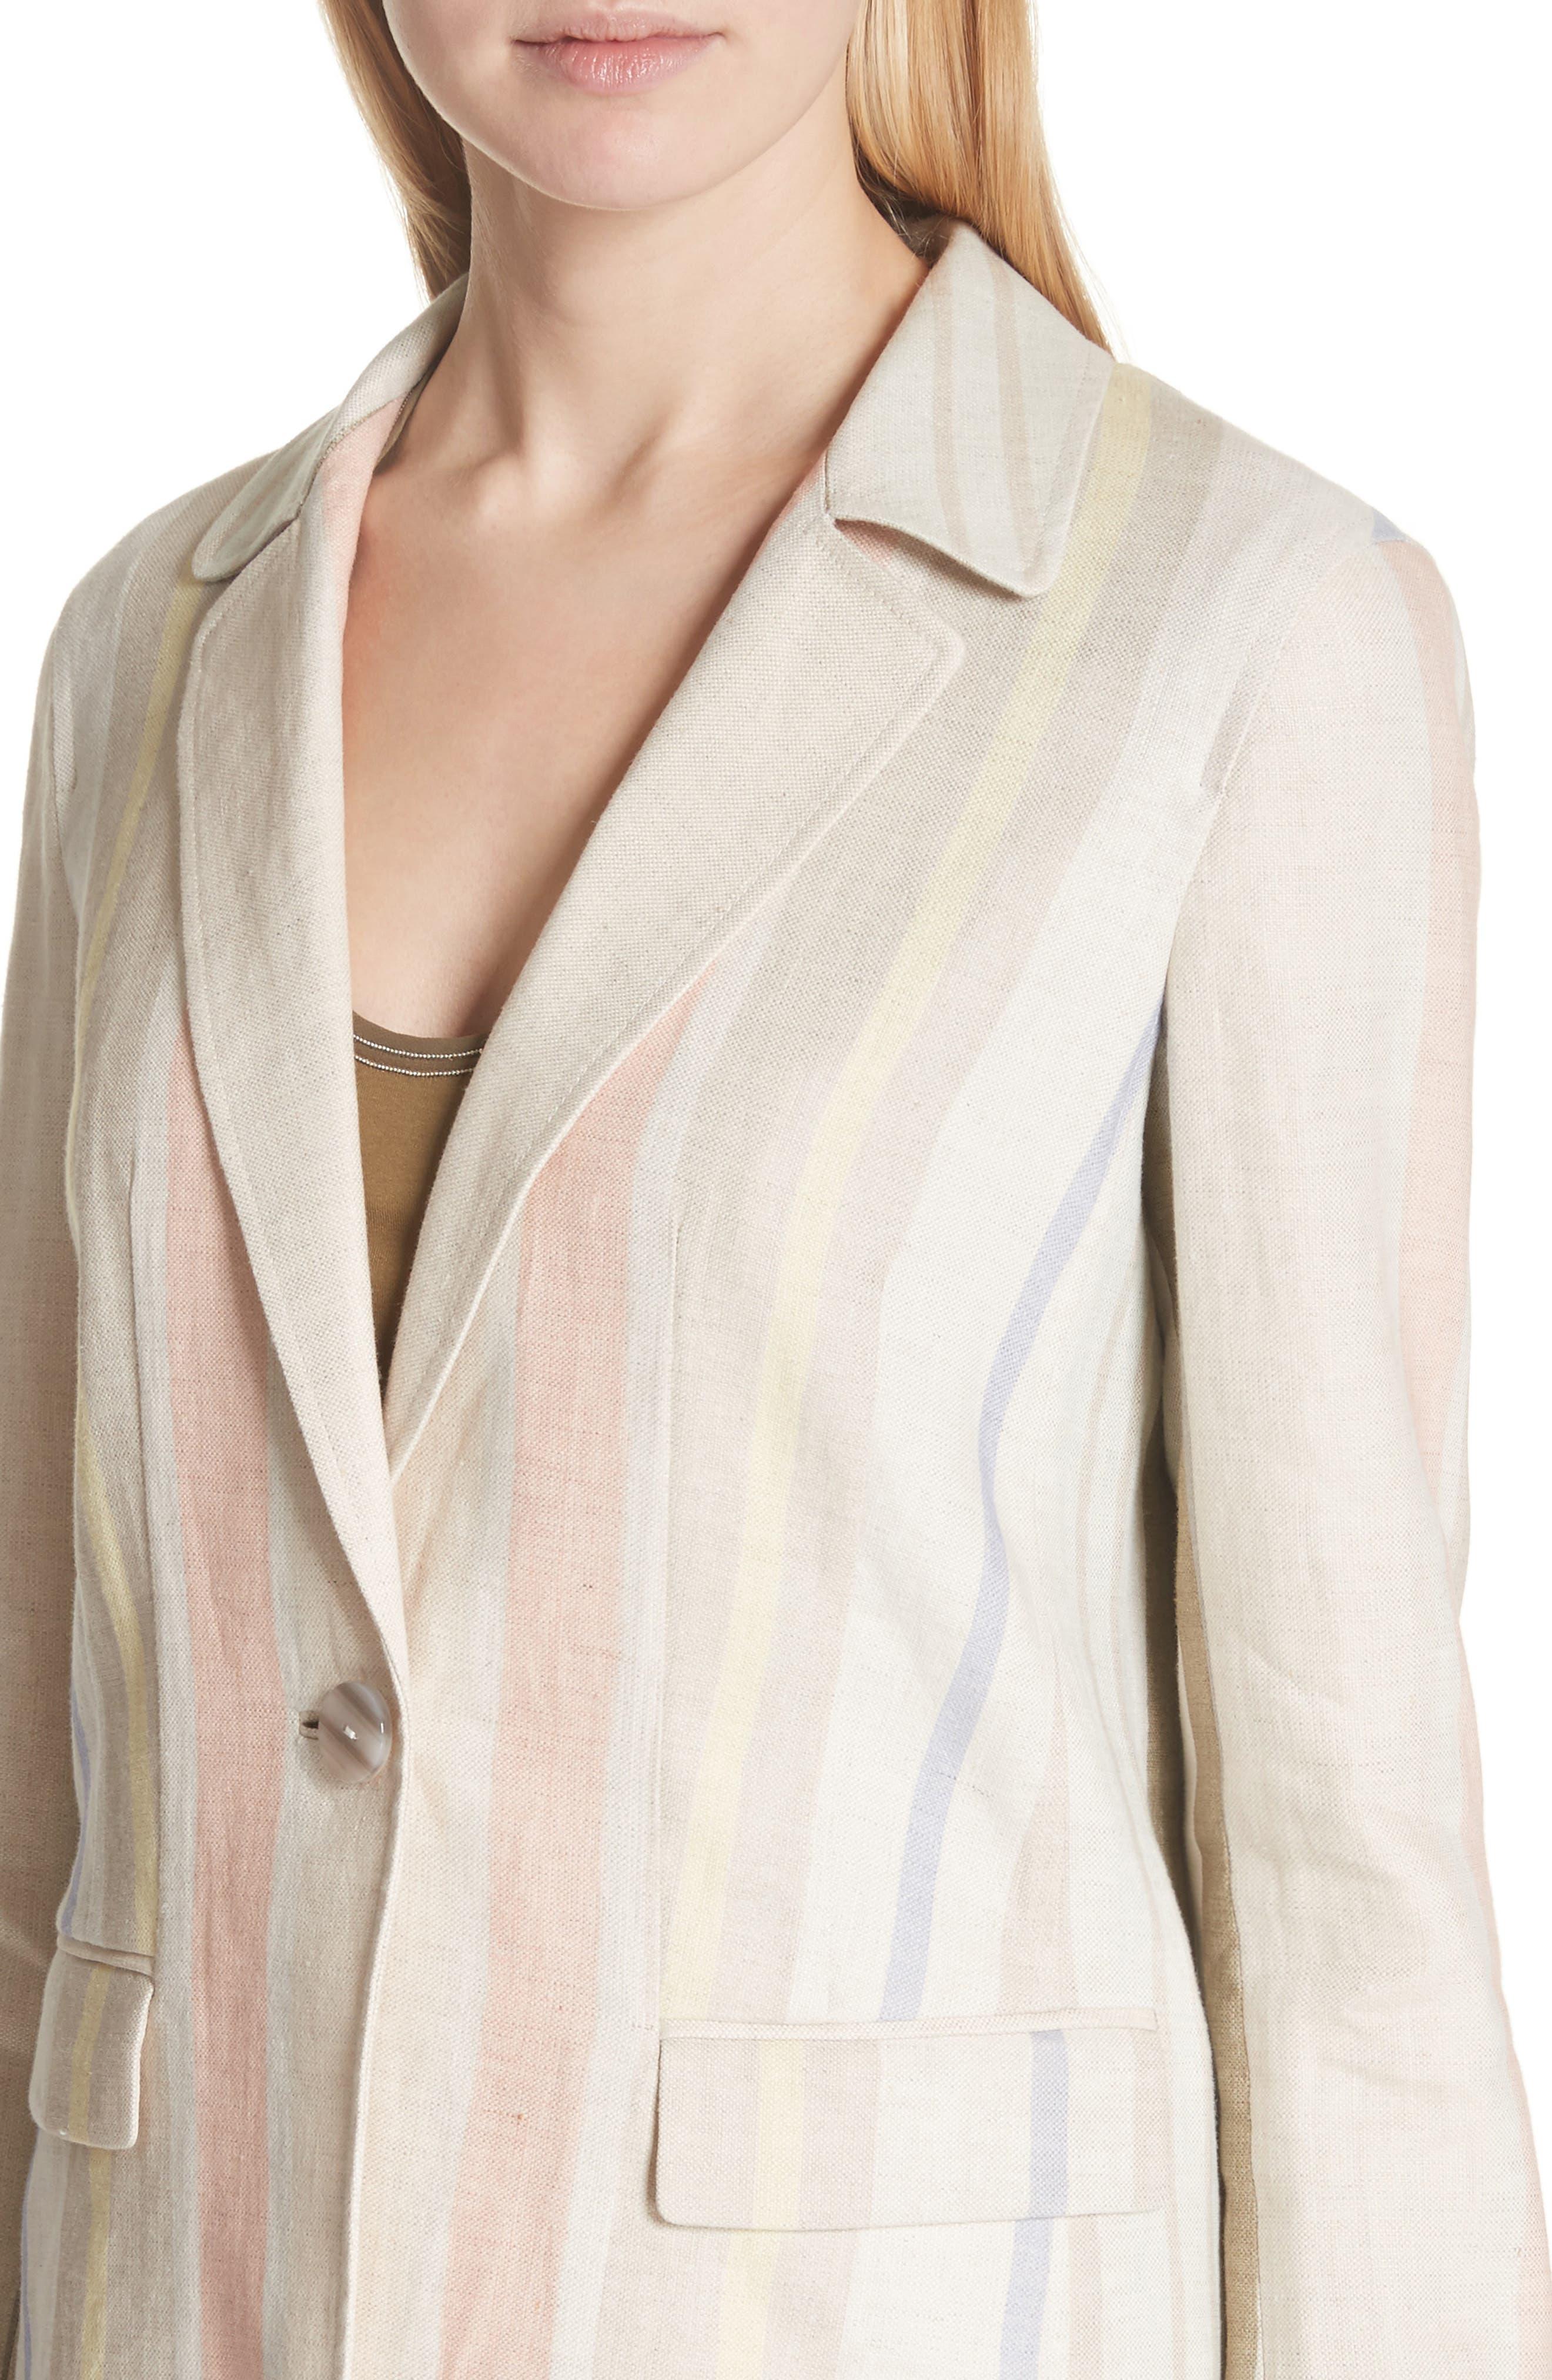 Marie Stripe Linen Jacket,                             Alternate thumbnail 4, color,